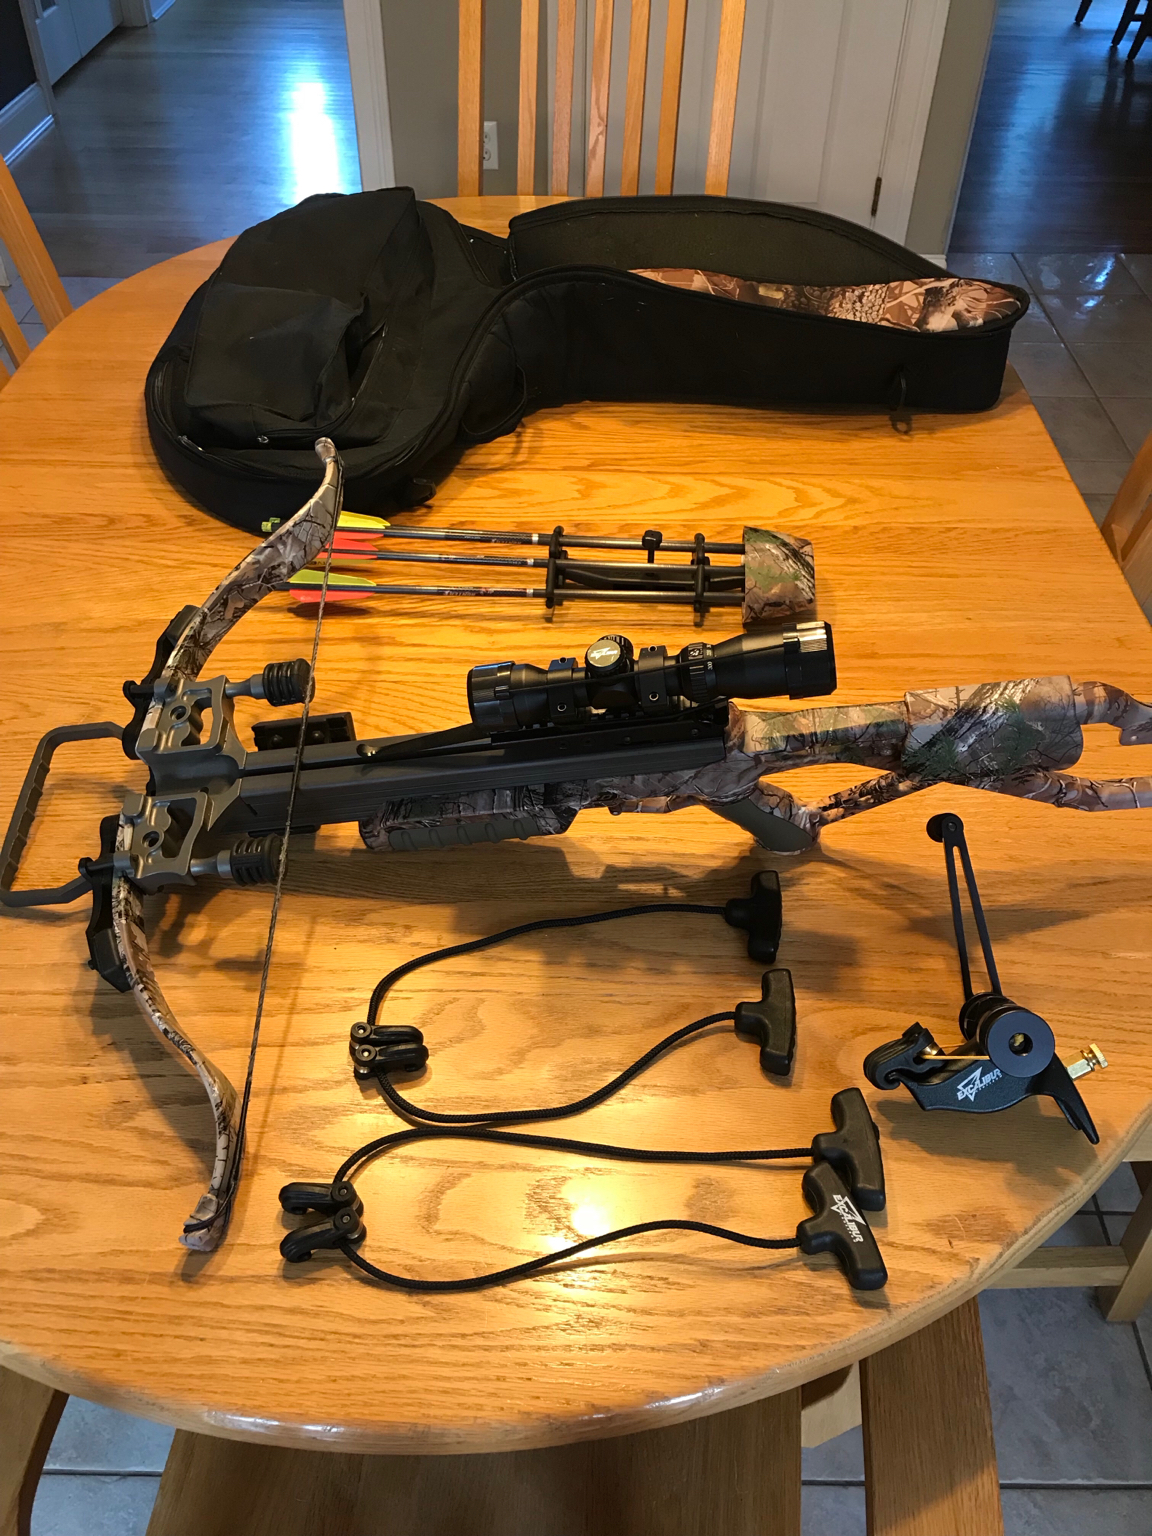 Excalibur micro cross bow - Hunting Equipment - Lake Ontario